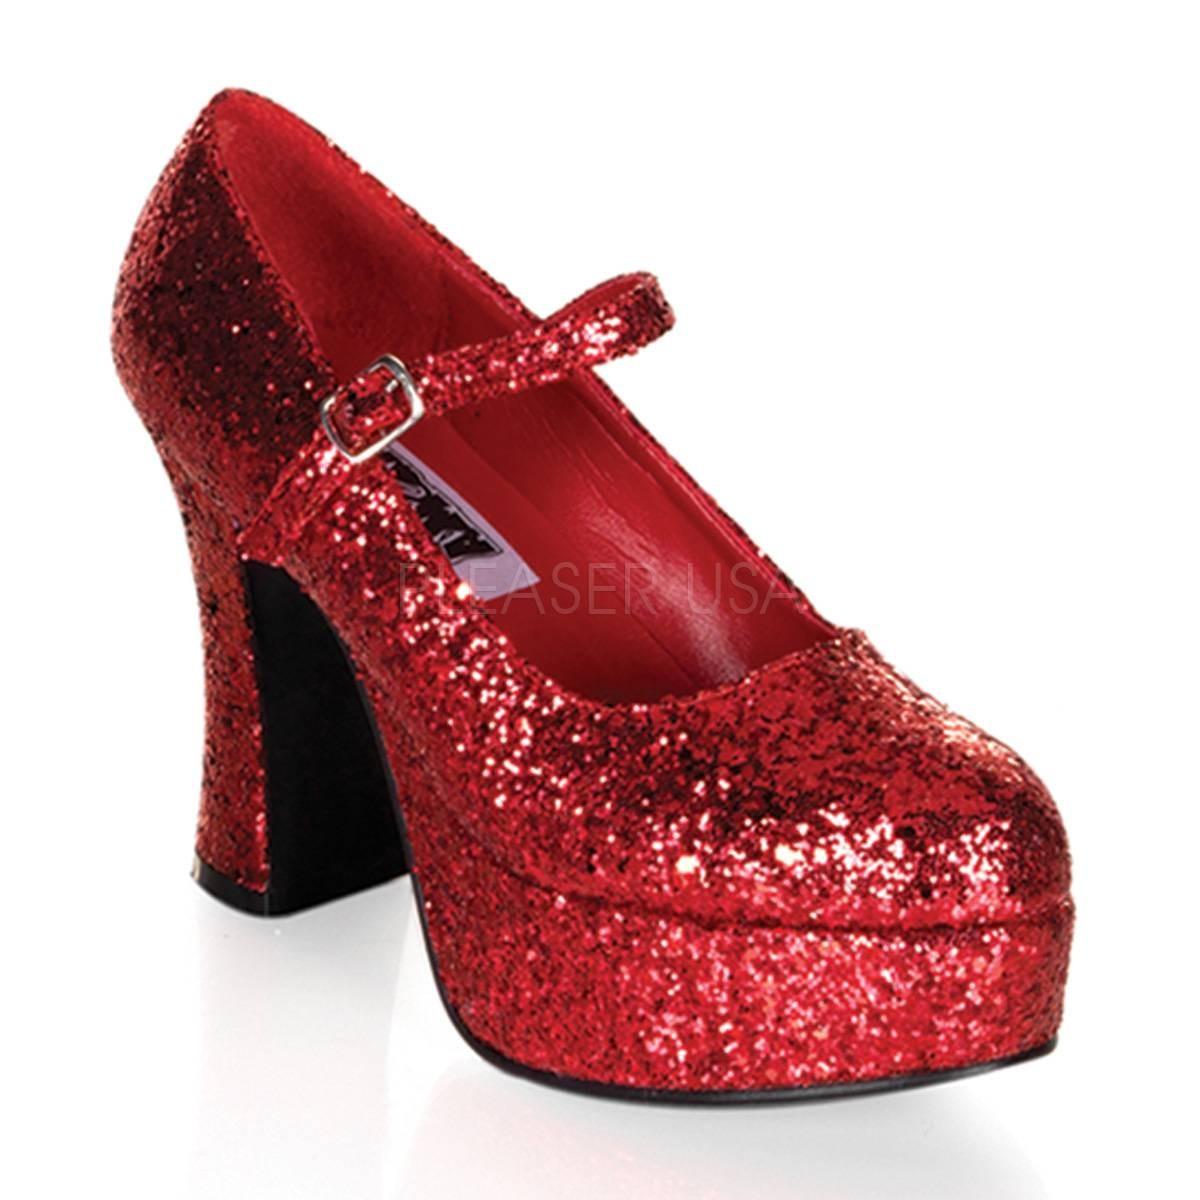 Pumps - MARYJANE 50G ° Damen Pumps ° Rot Glitter ° Funtasma  - Onlineshop RedSixty